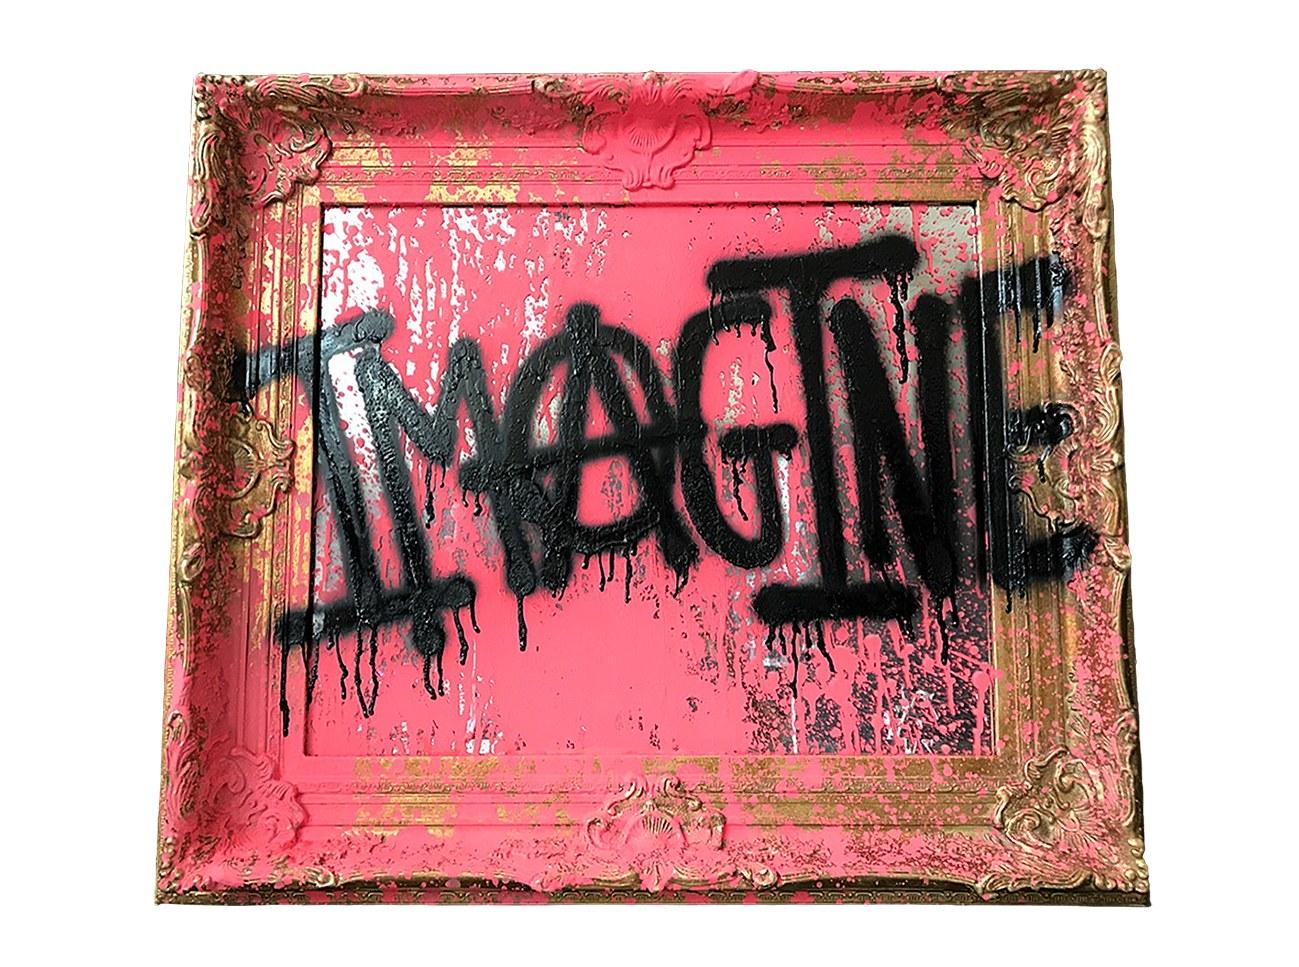 Diego Venturino - Imagine mirror - Art